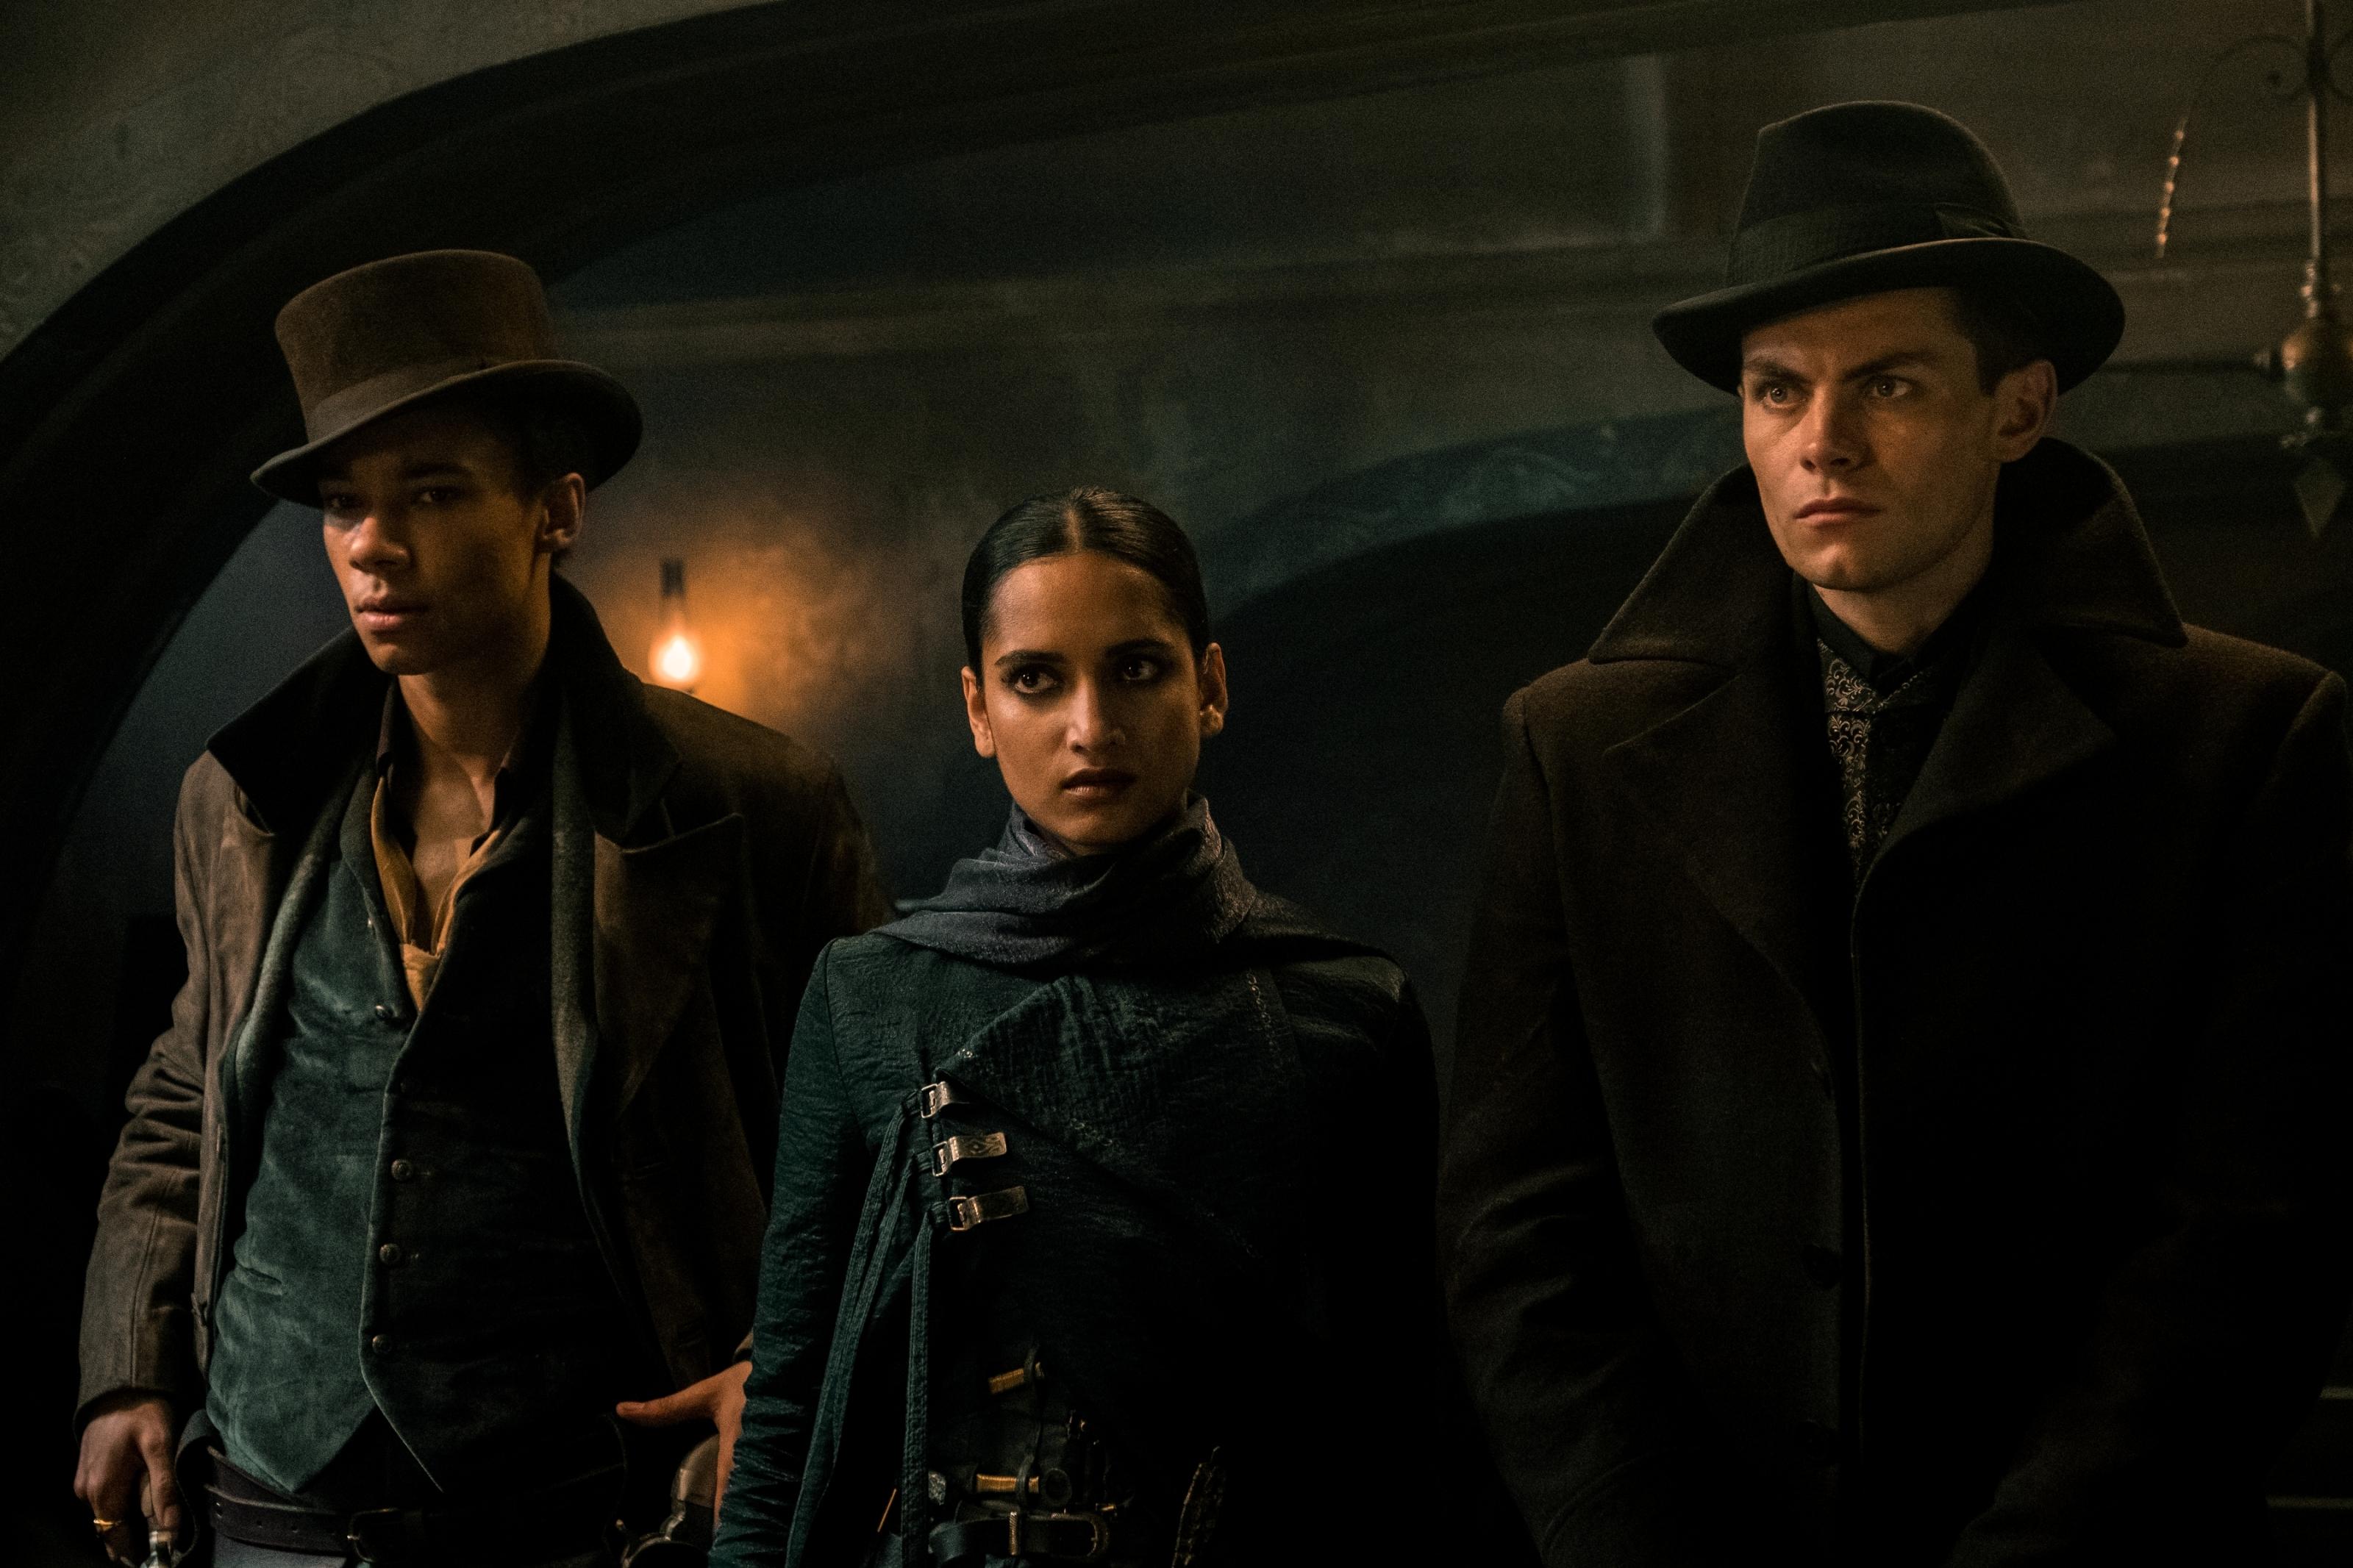 Shadow and Bone books - Shadow and Bone cast - Shadow and Bone season 2 - Netflix